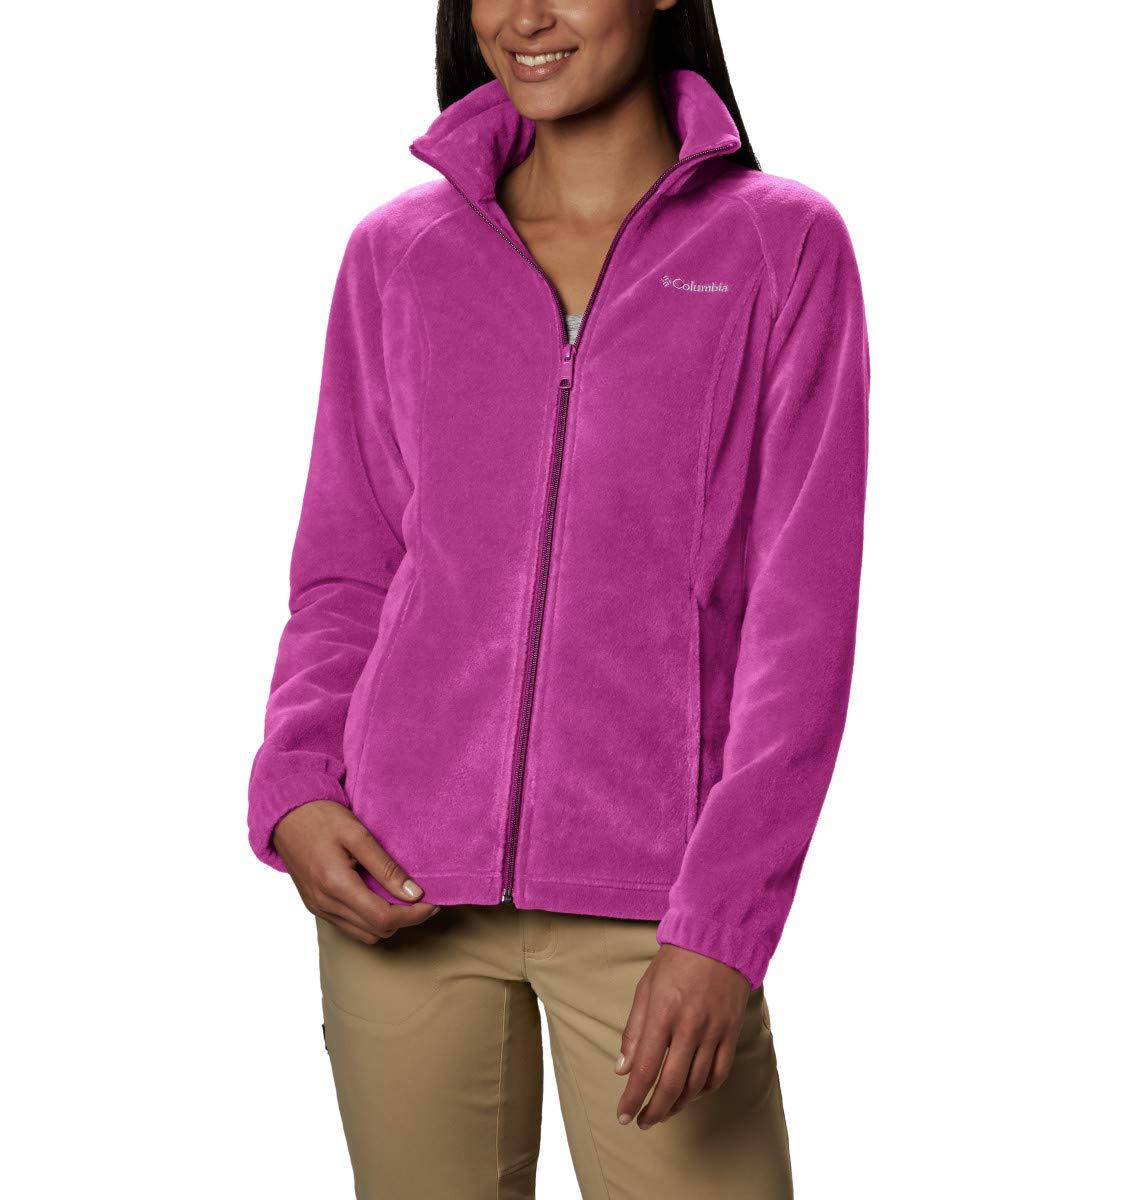 Columbia Women's Benton Springs Full Zip Jacket, Soft Fleece with Classic Fit, Fuchsia, Medium by Columbia